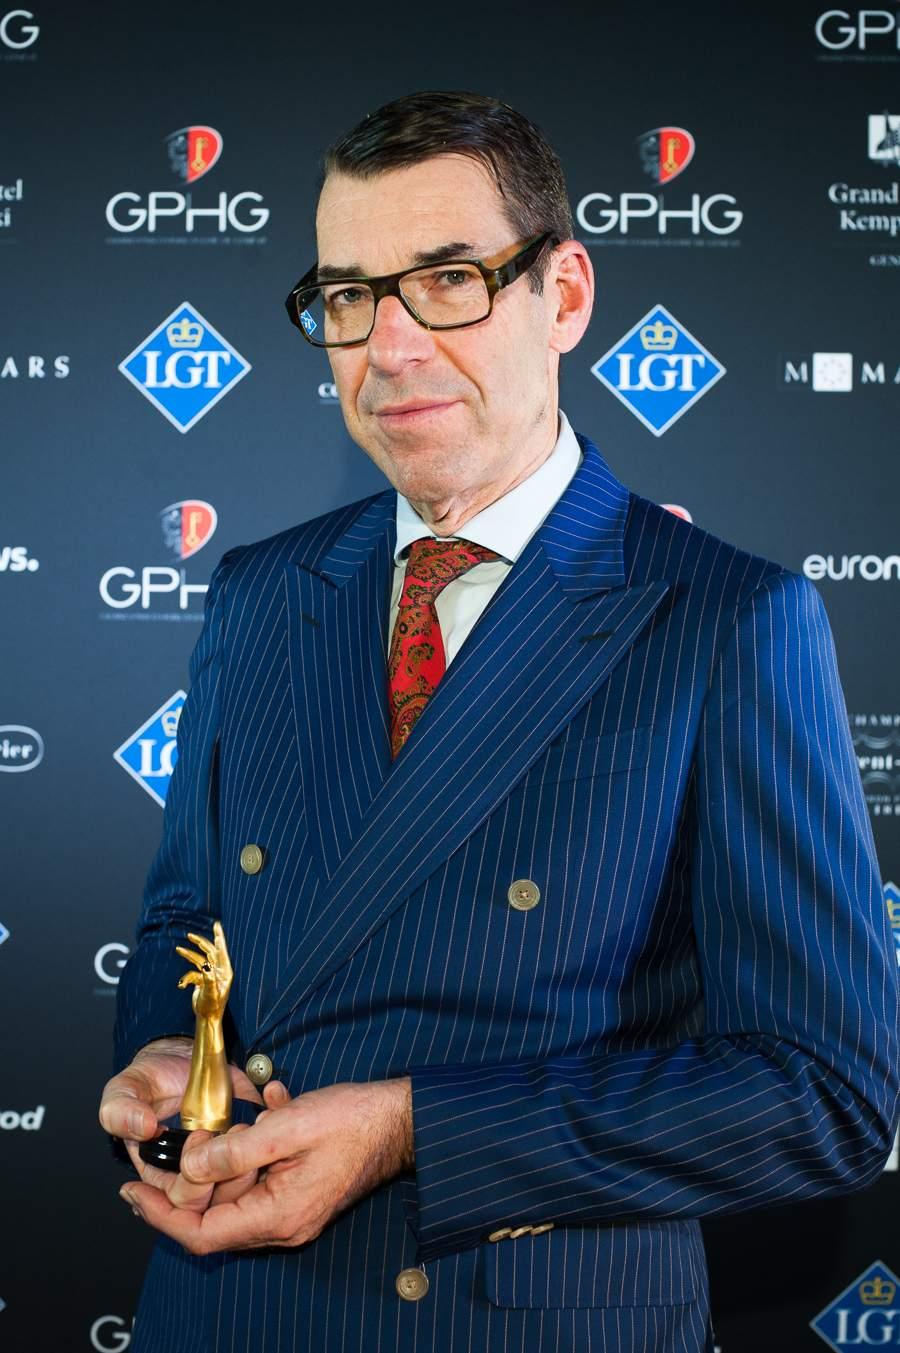 Christian Selmoni, Style and Heritage Director at Vacheron Constantin